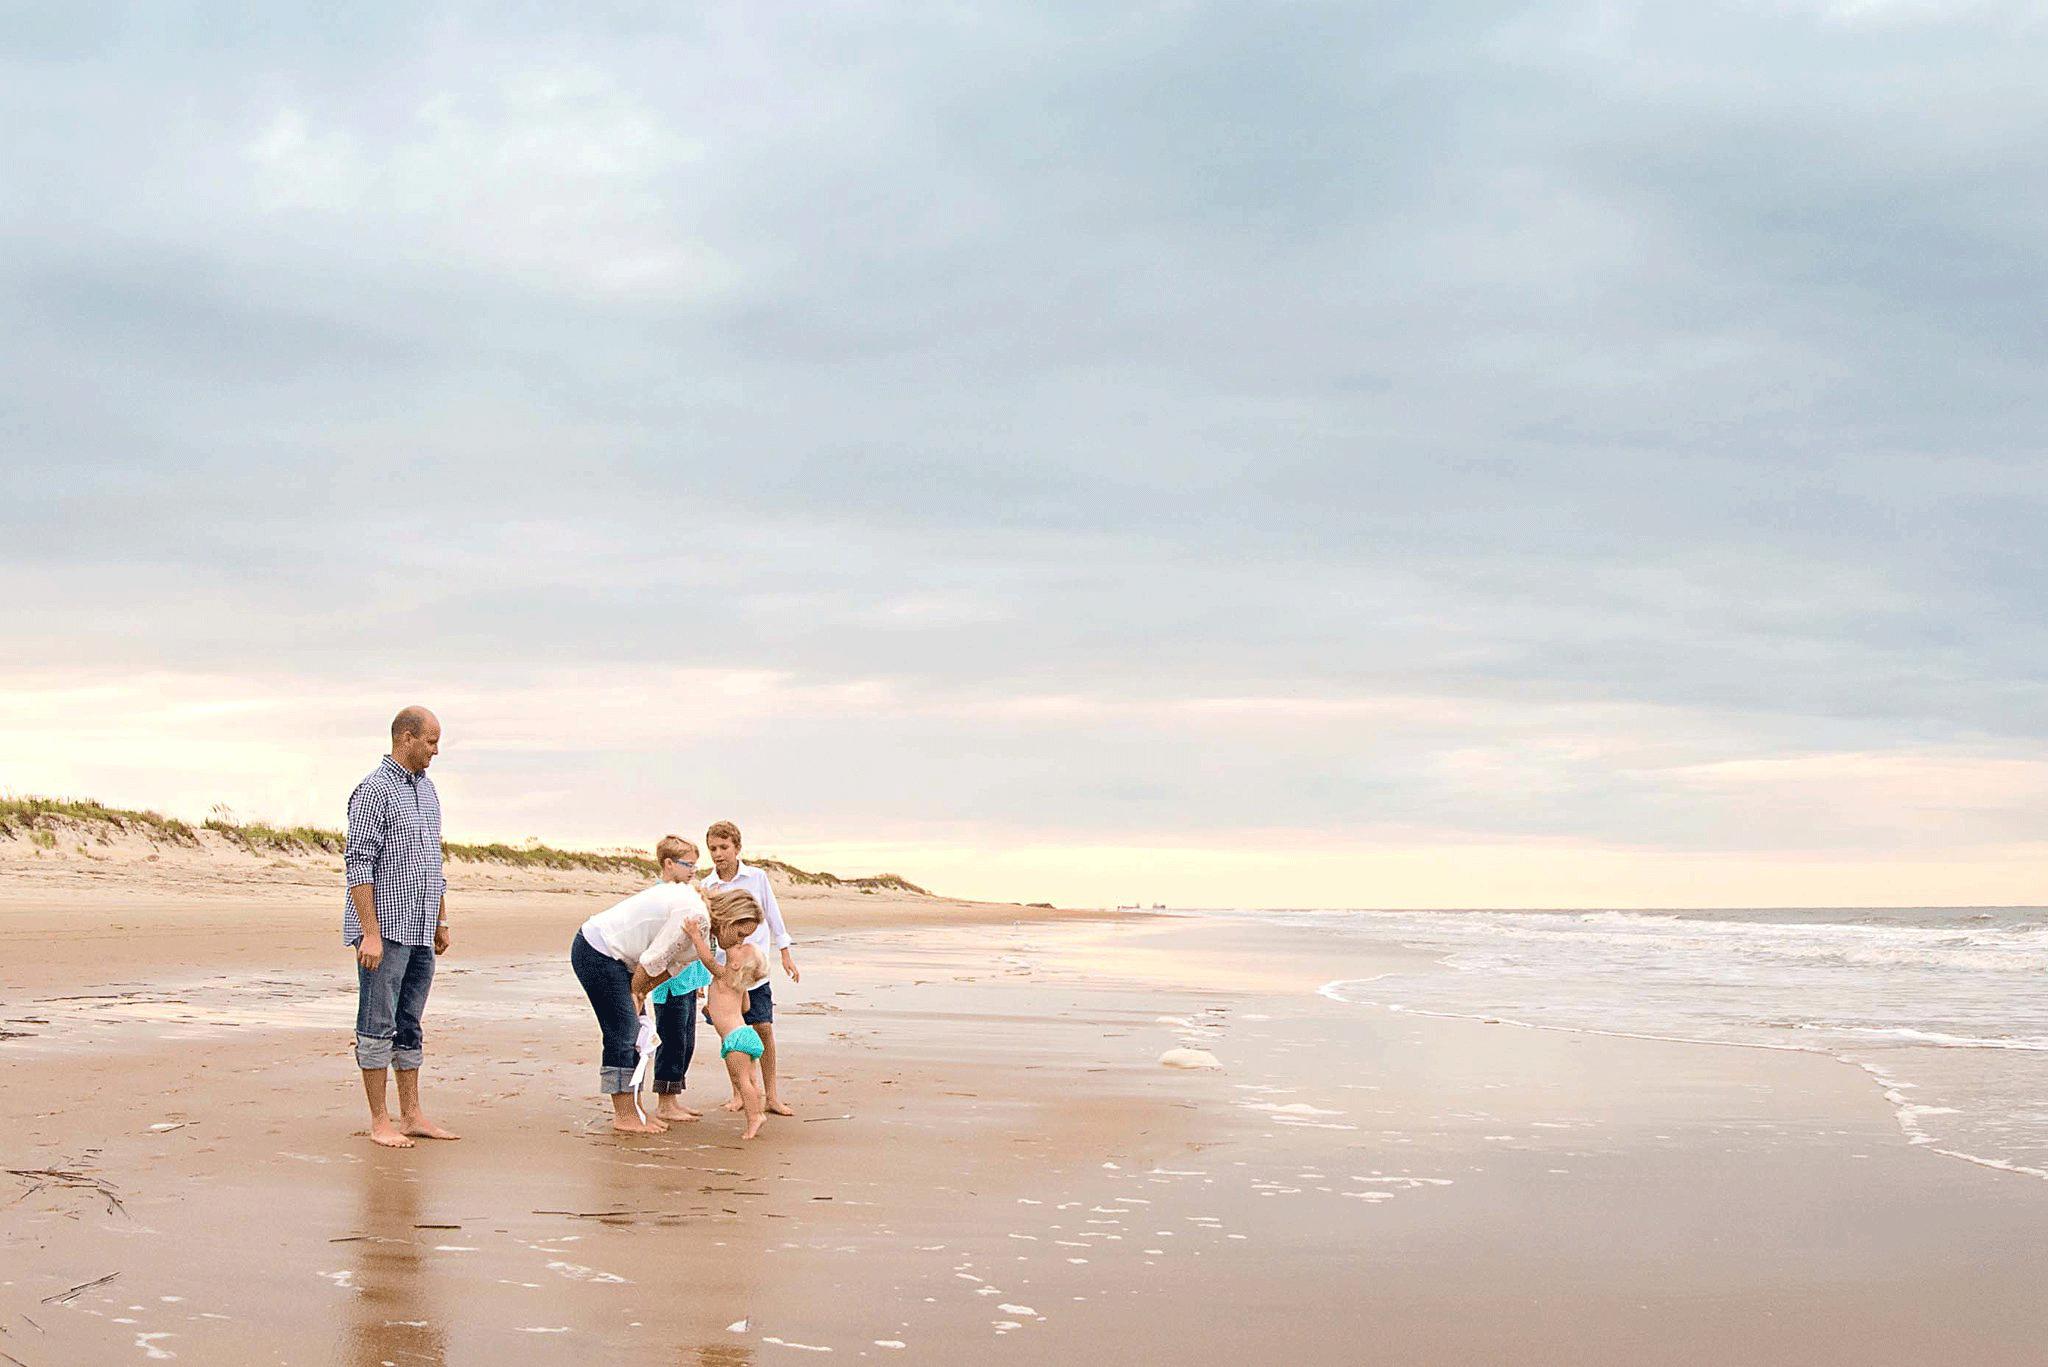 virginia-beach-family-photographers-lifestyle-beach-photography-melissa-bliss-photography-norfolk-portsmouth-chesapeake-photographer.png